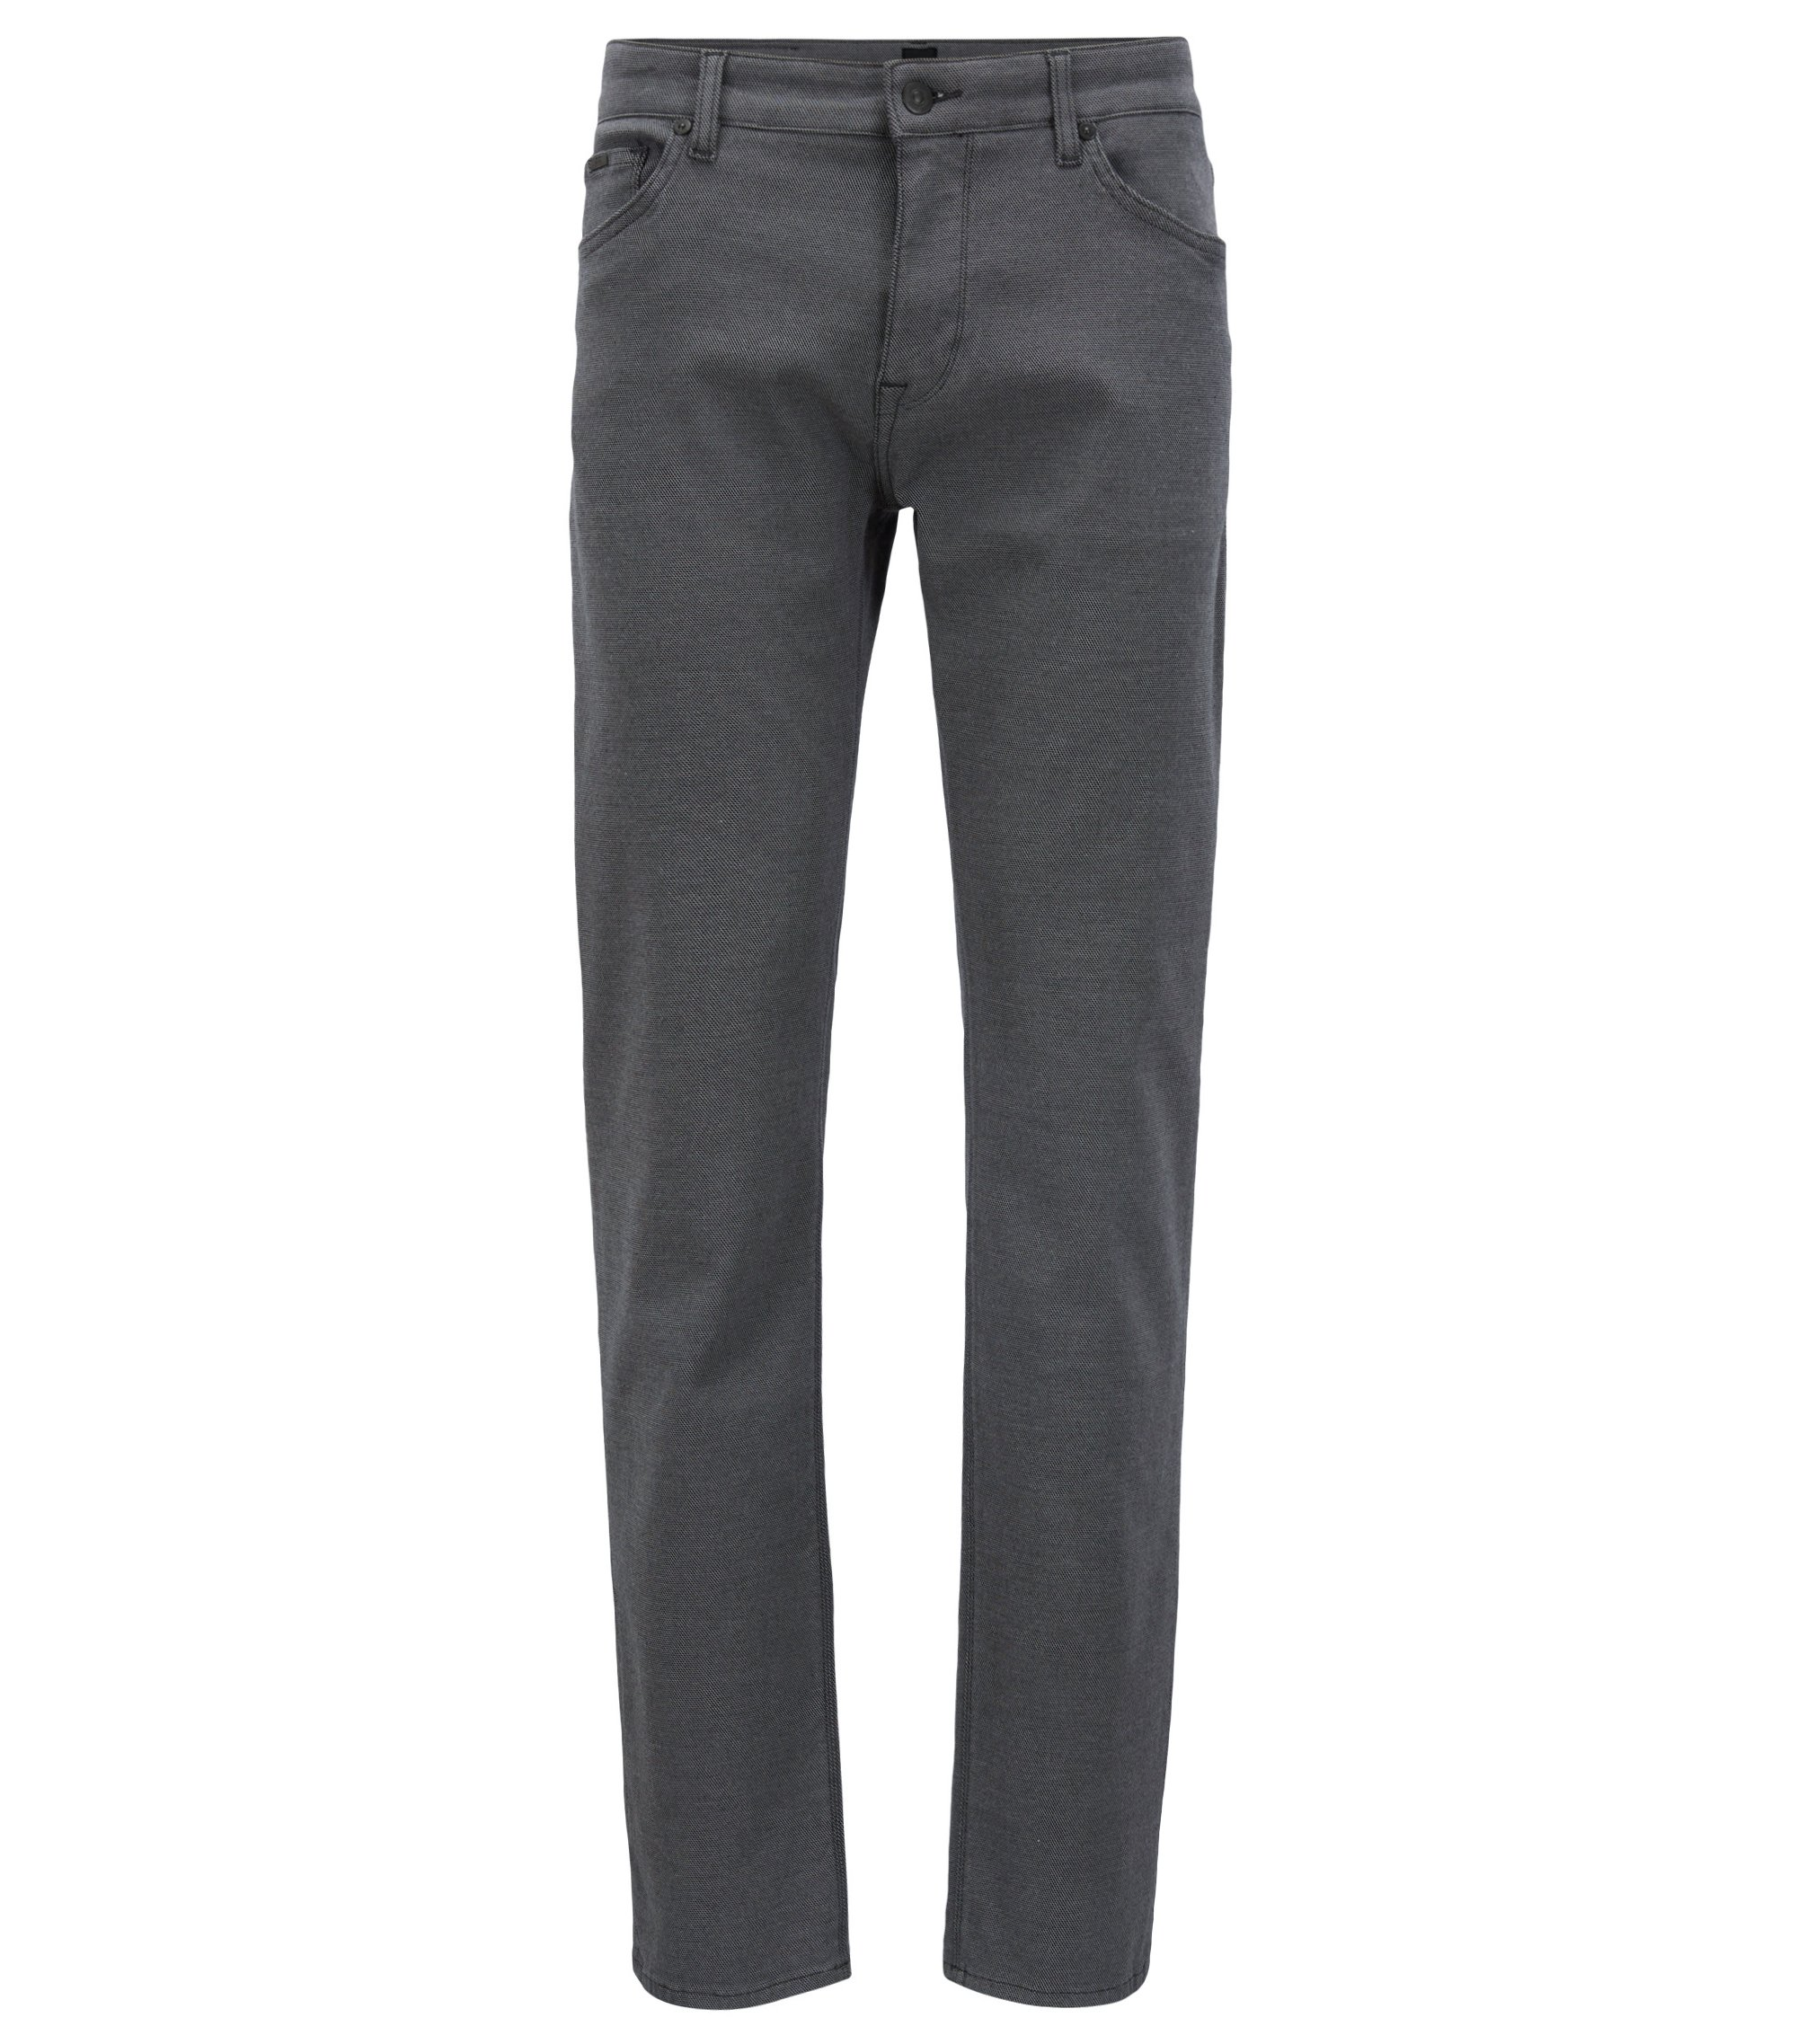 Regular-Fit Jeans aus strukturiertem Stretch-Gewebe, Grau